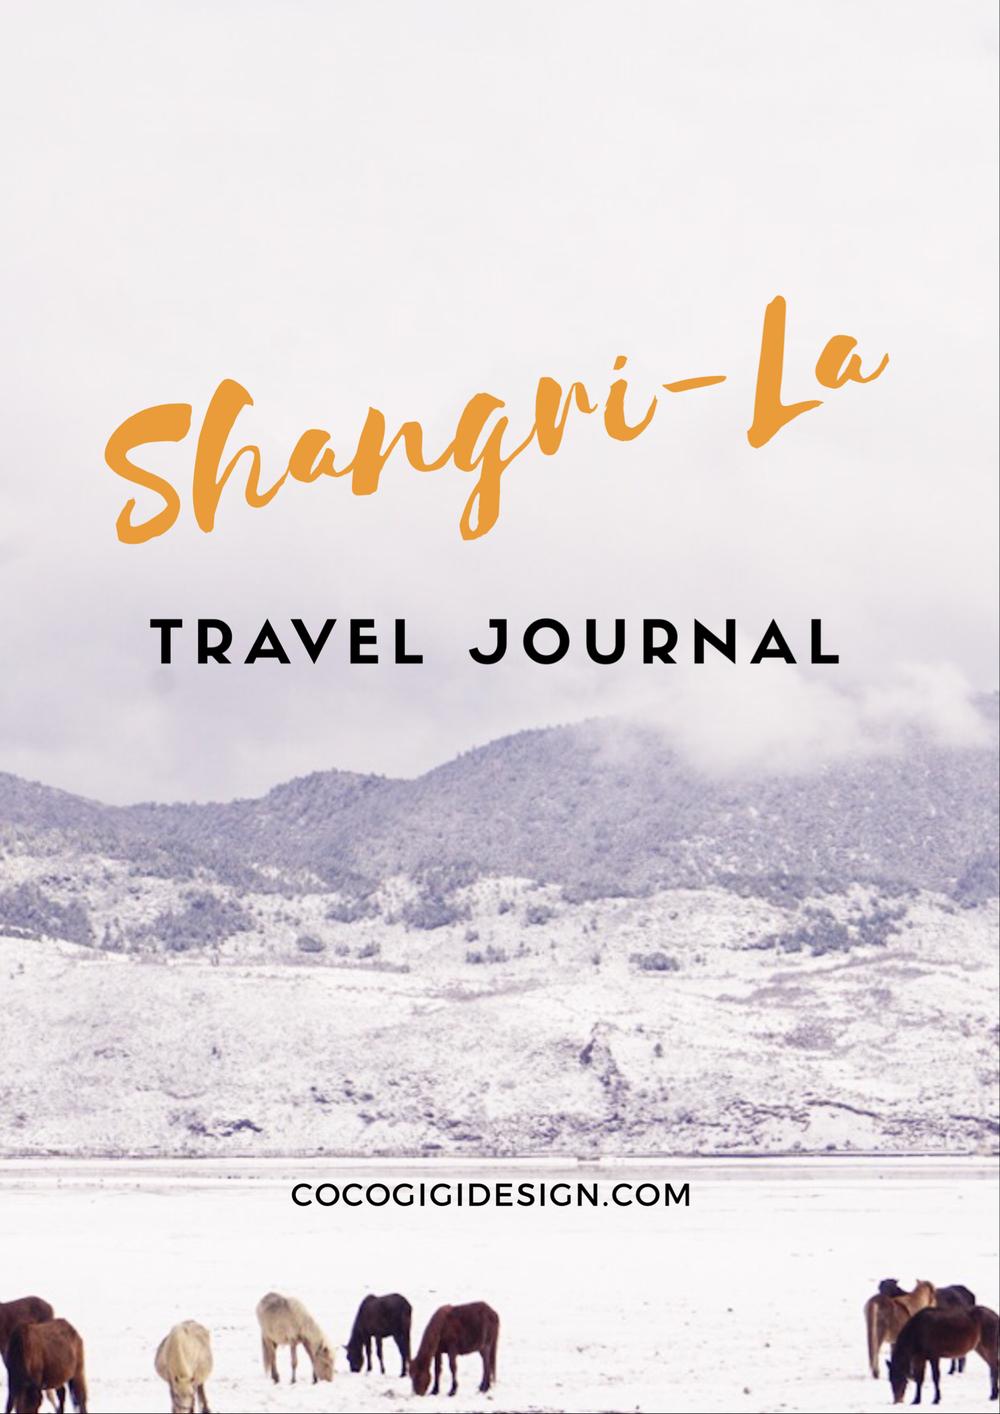 Gina Maldonado - Shangri La, China travel journal.PNG